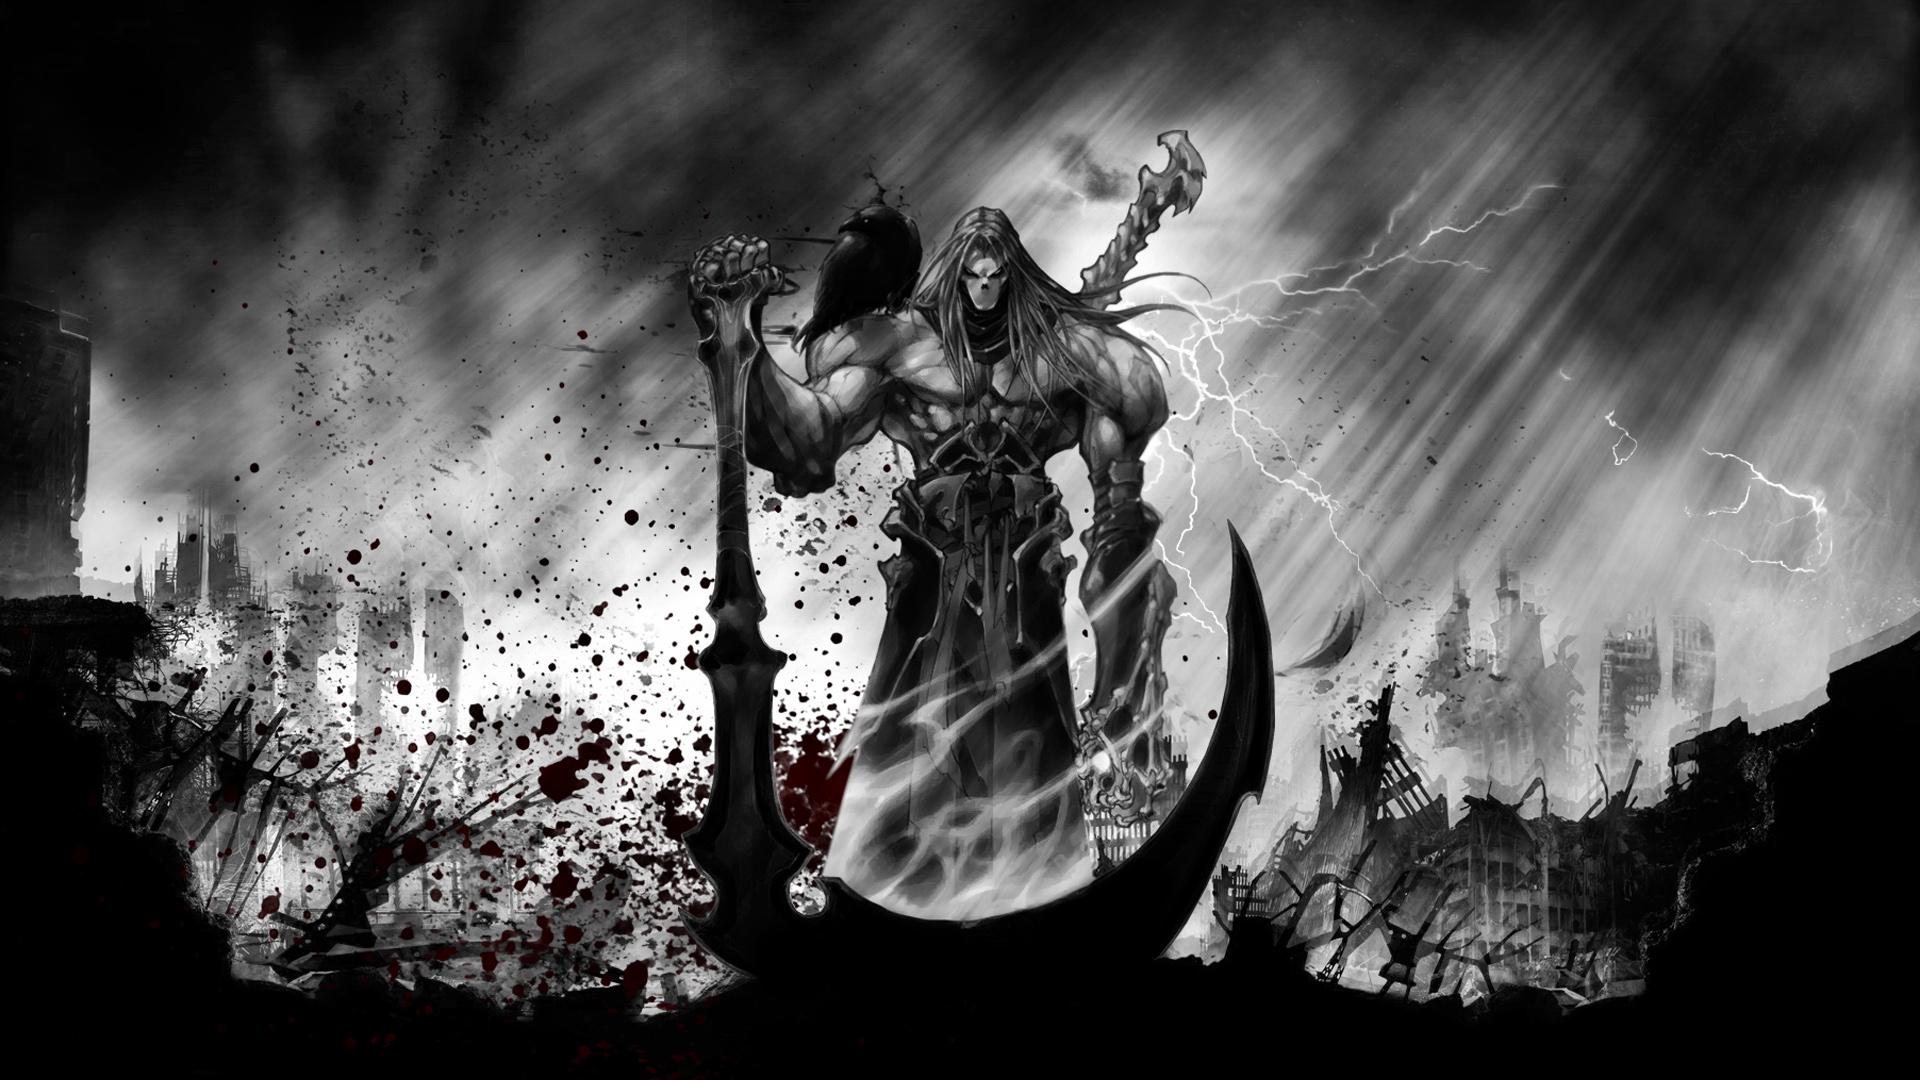 Сильнейший герой - Страница 3 Darksiders_2_scythe-HD